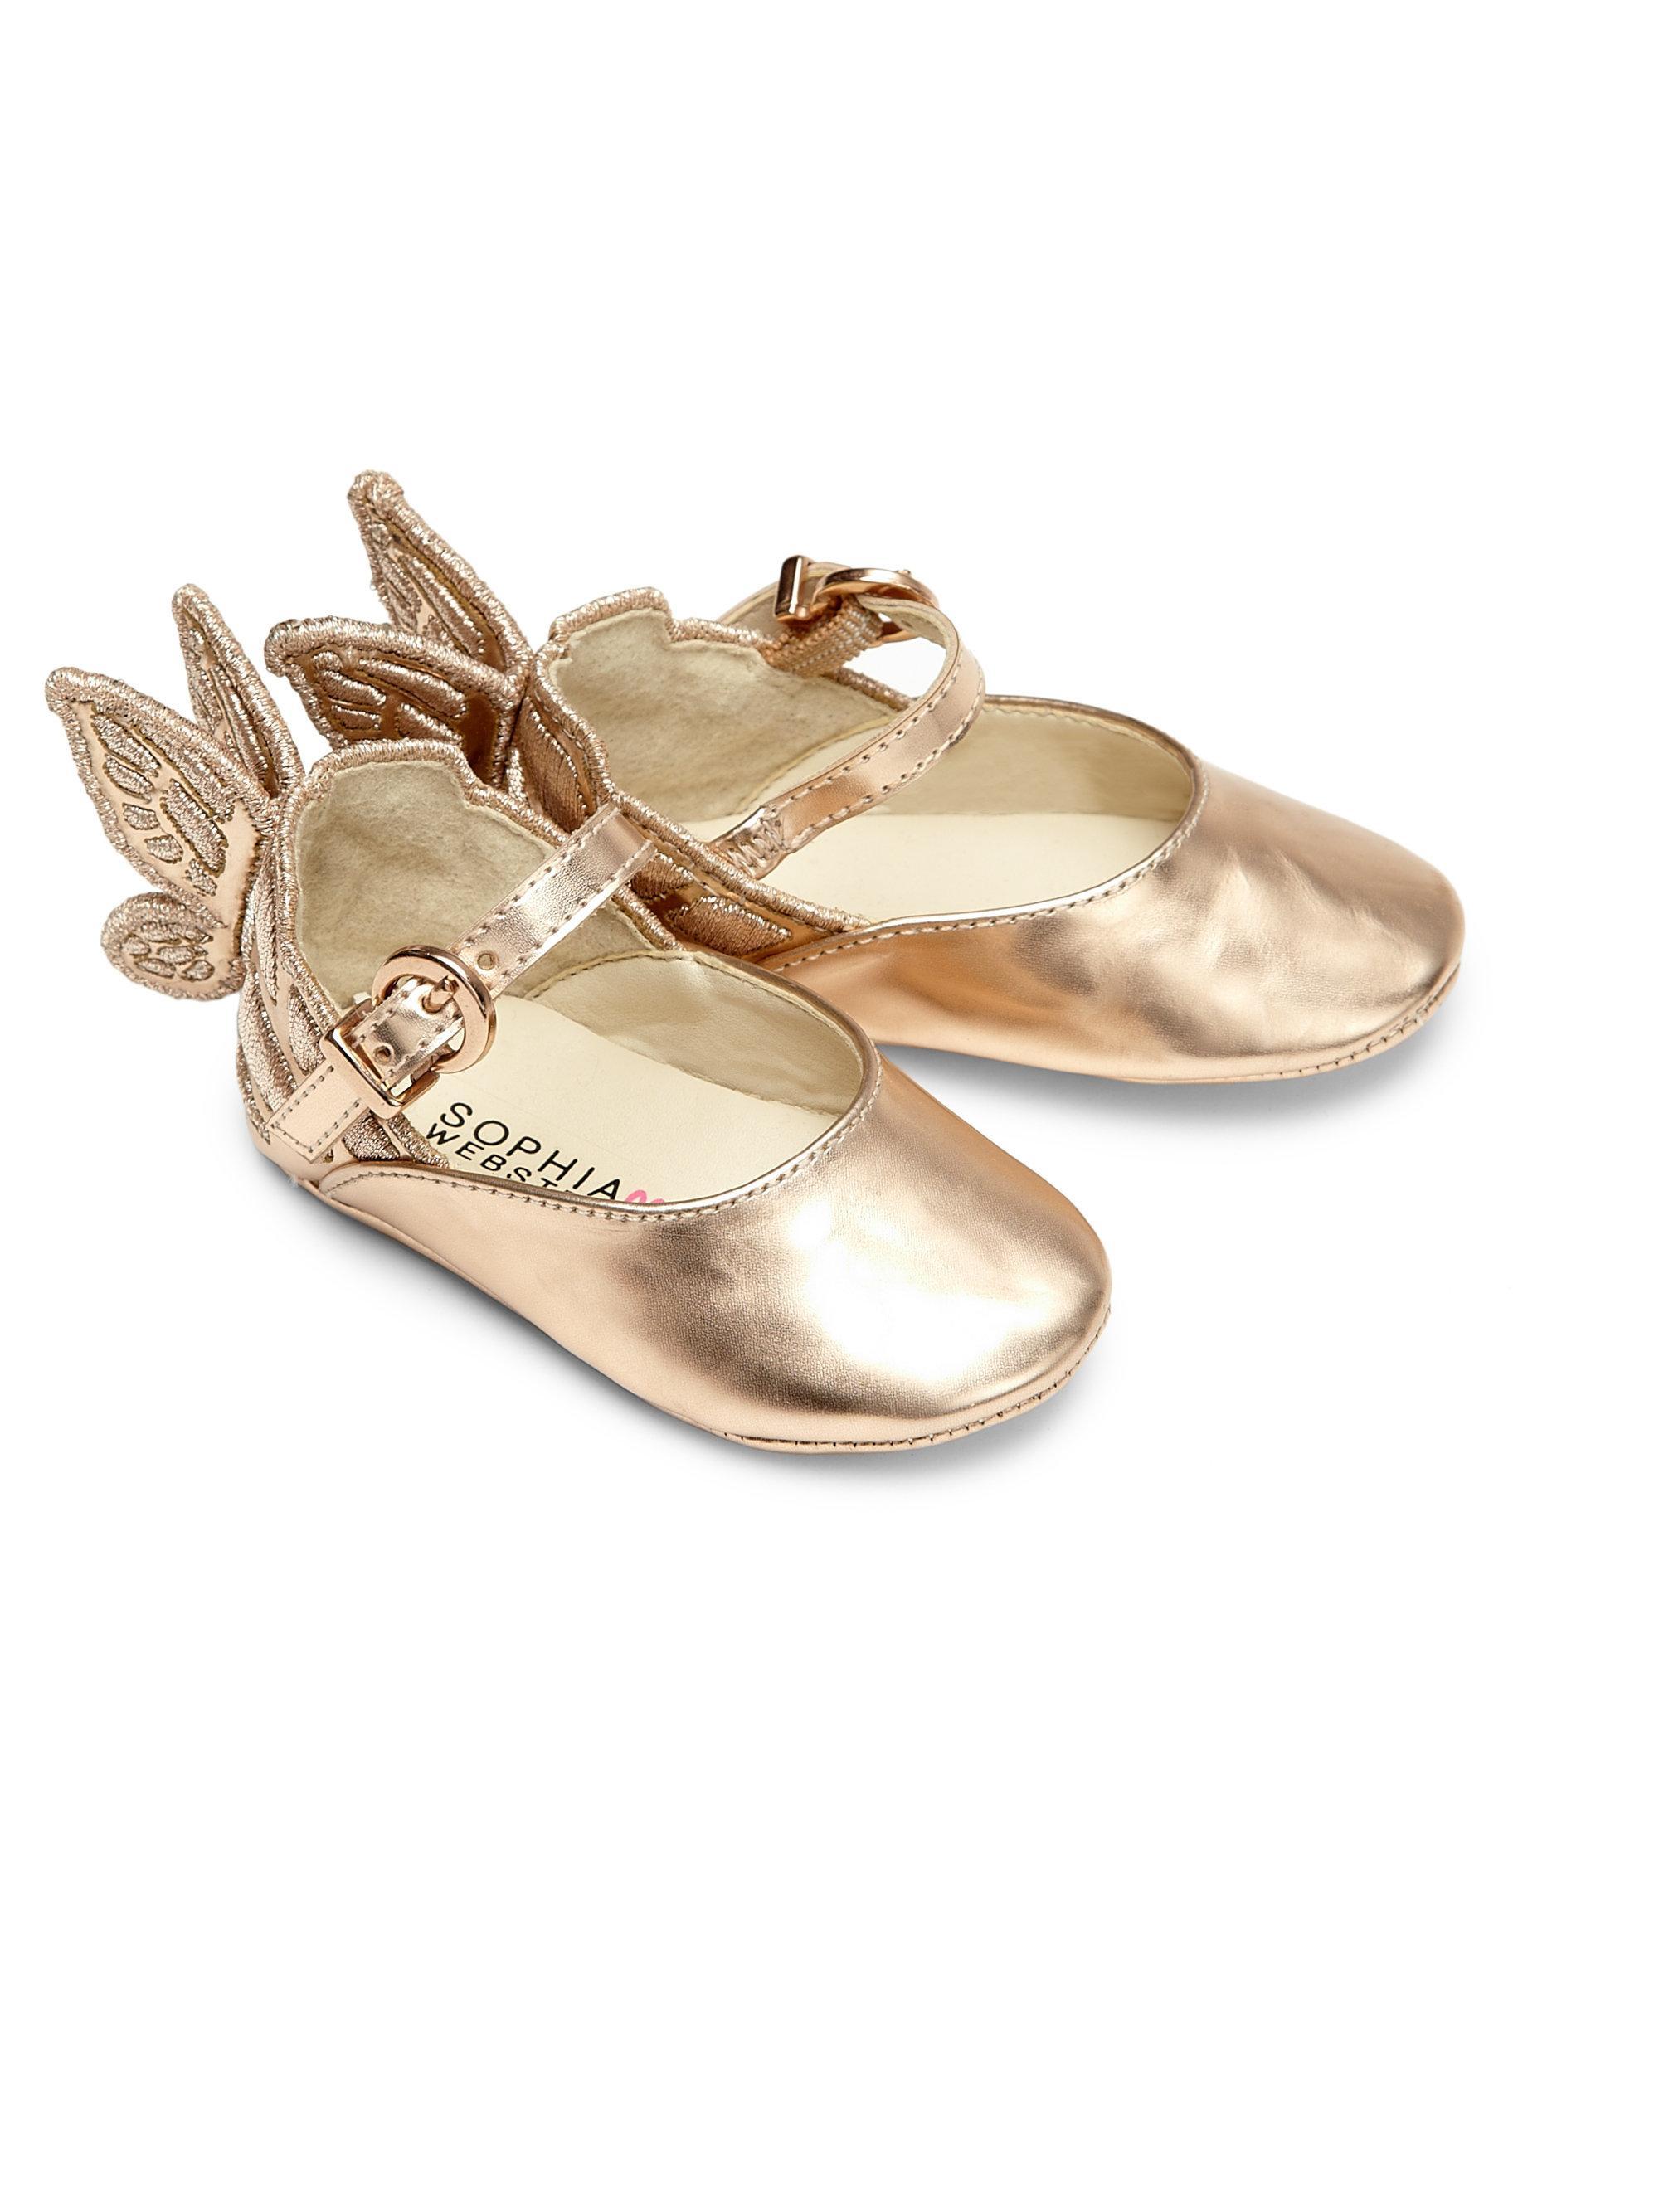 5166911300a39 Sophia Webster Baby s Mini Chiara Wing Leather Flats in Metallic - Lyst